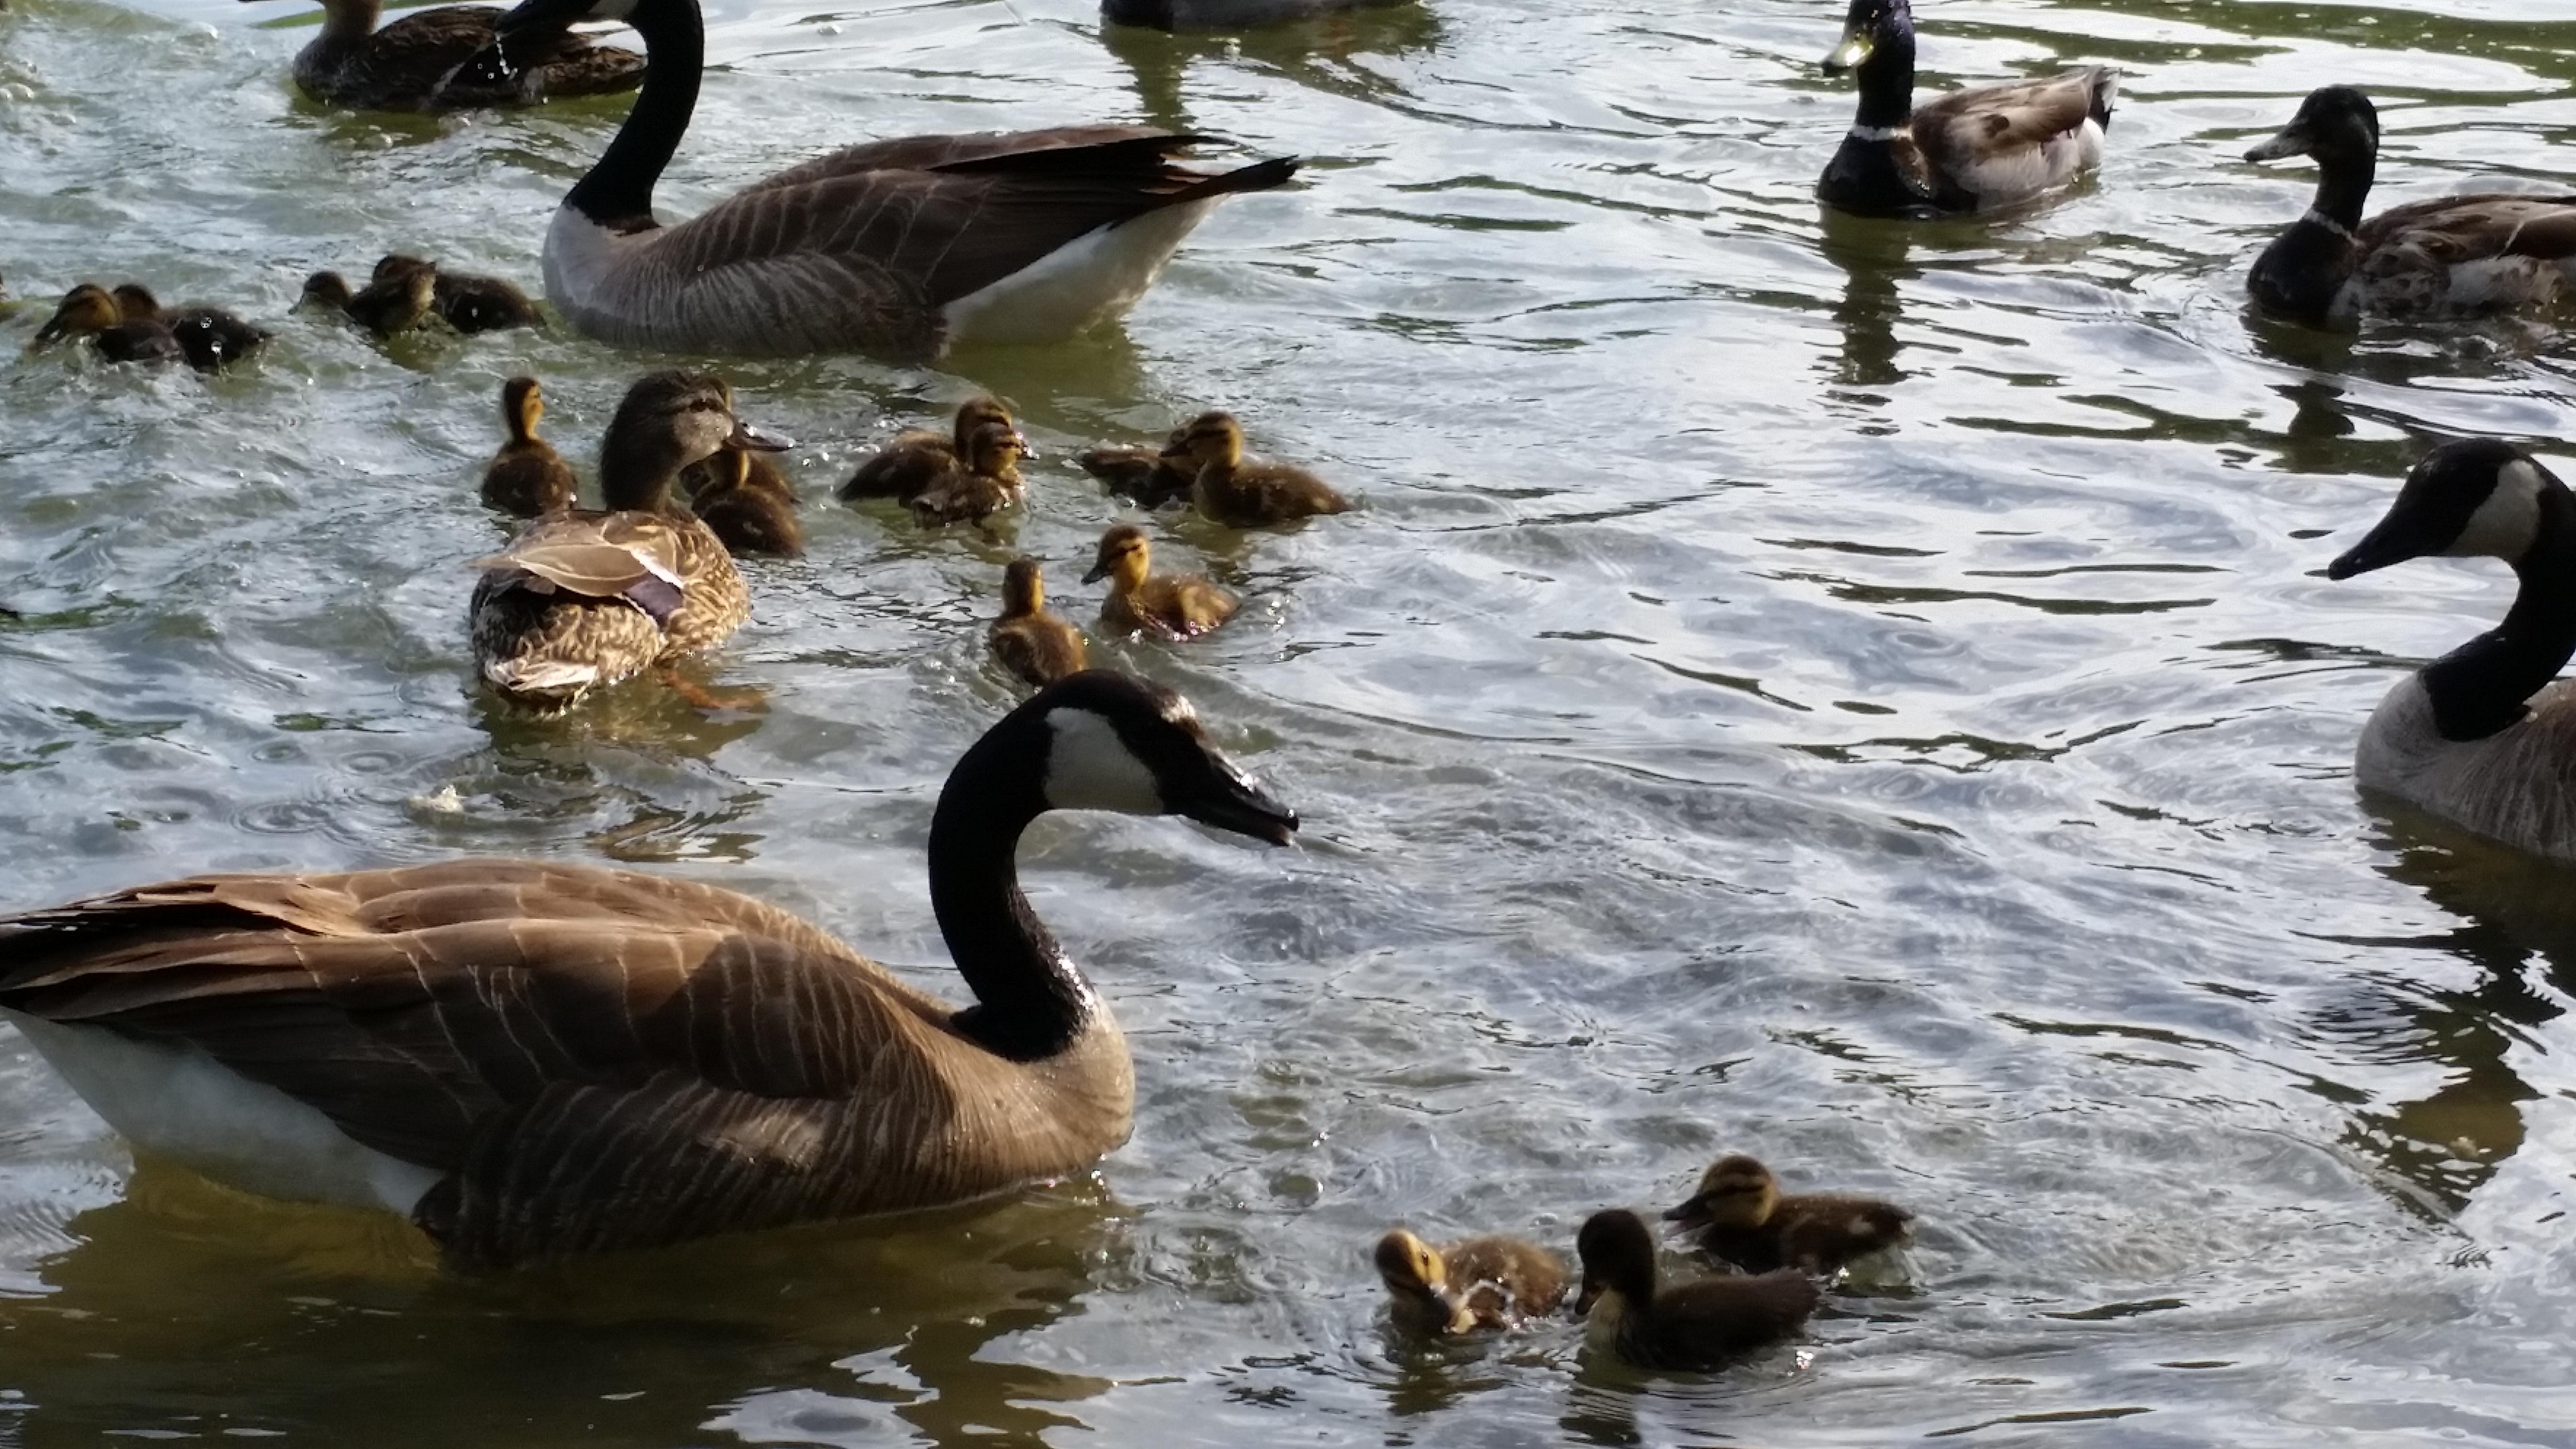 Geese at Liberty Park